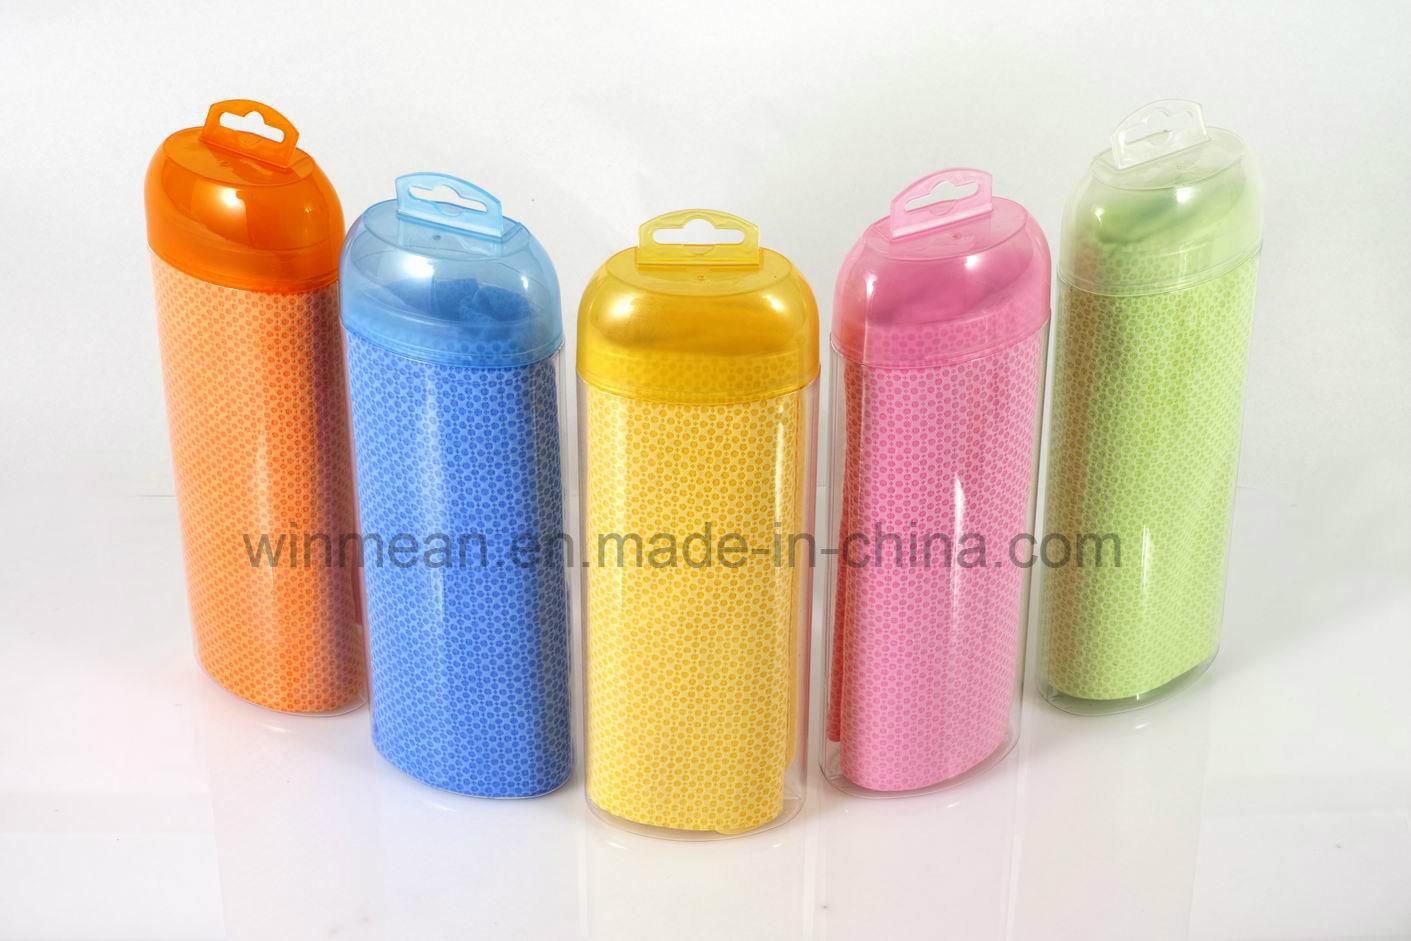 Ice Towel Cooling Towel Manufacturer